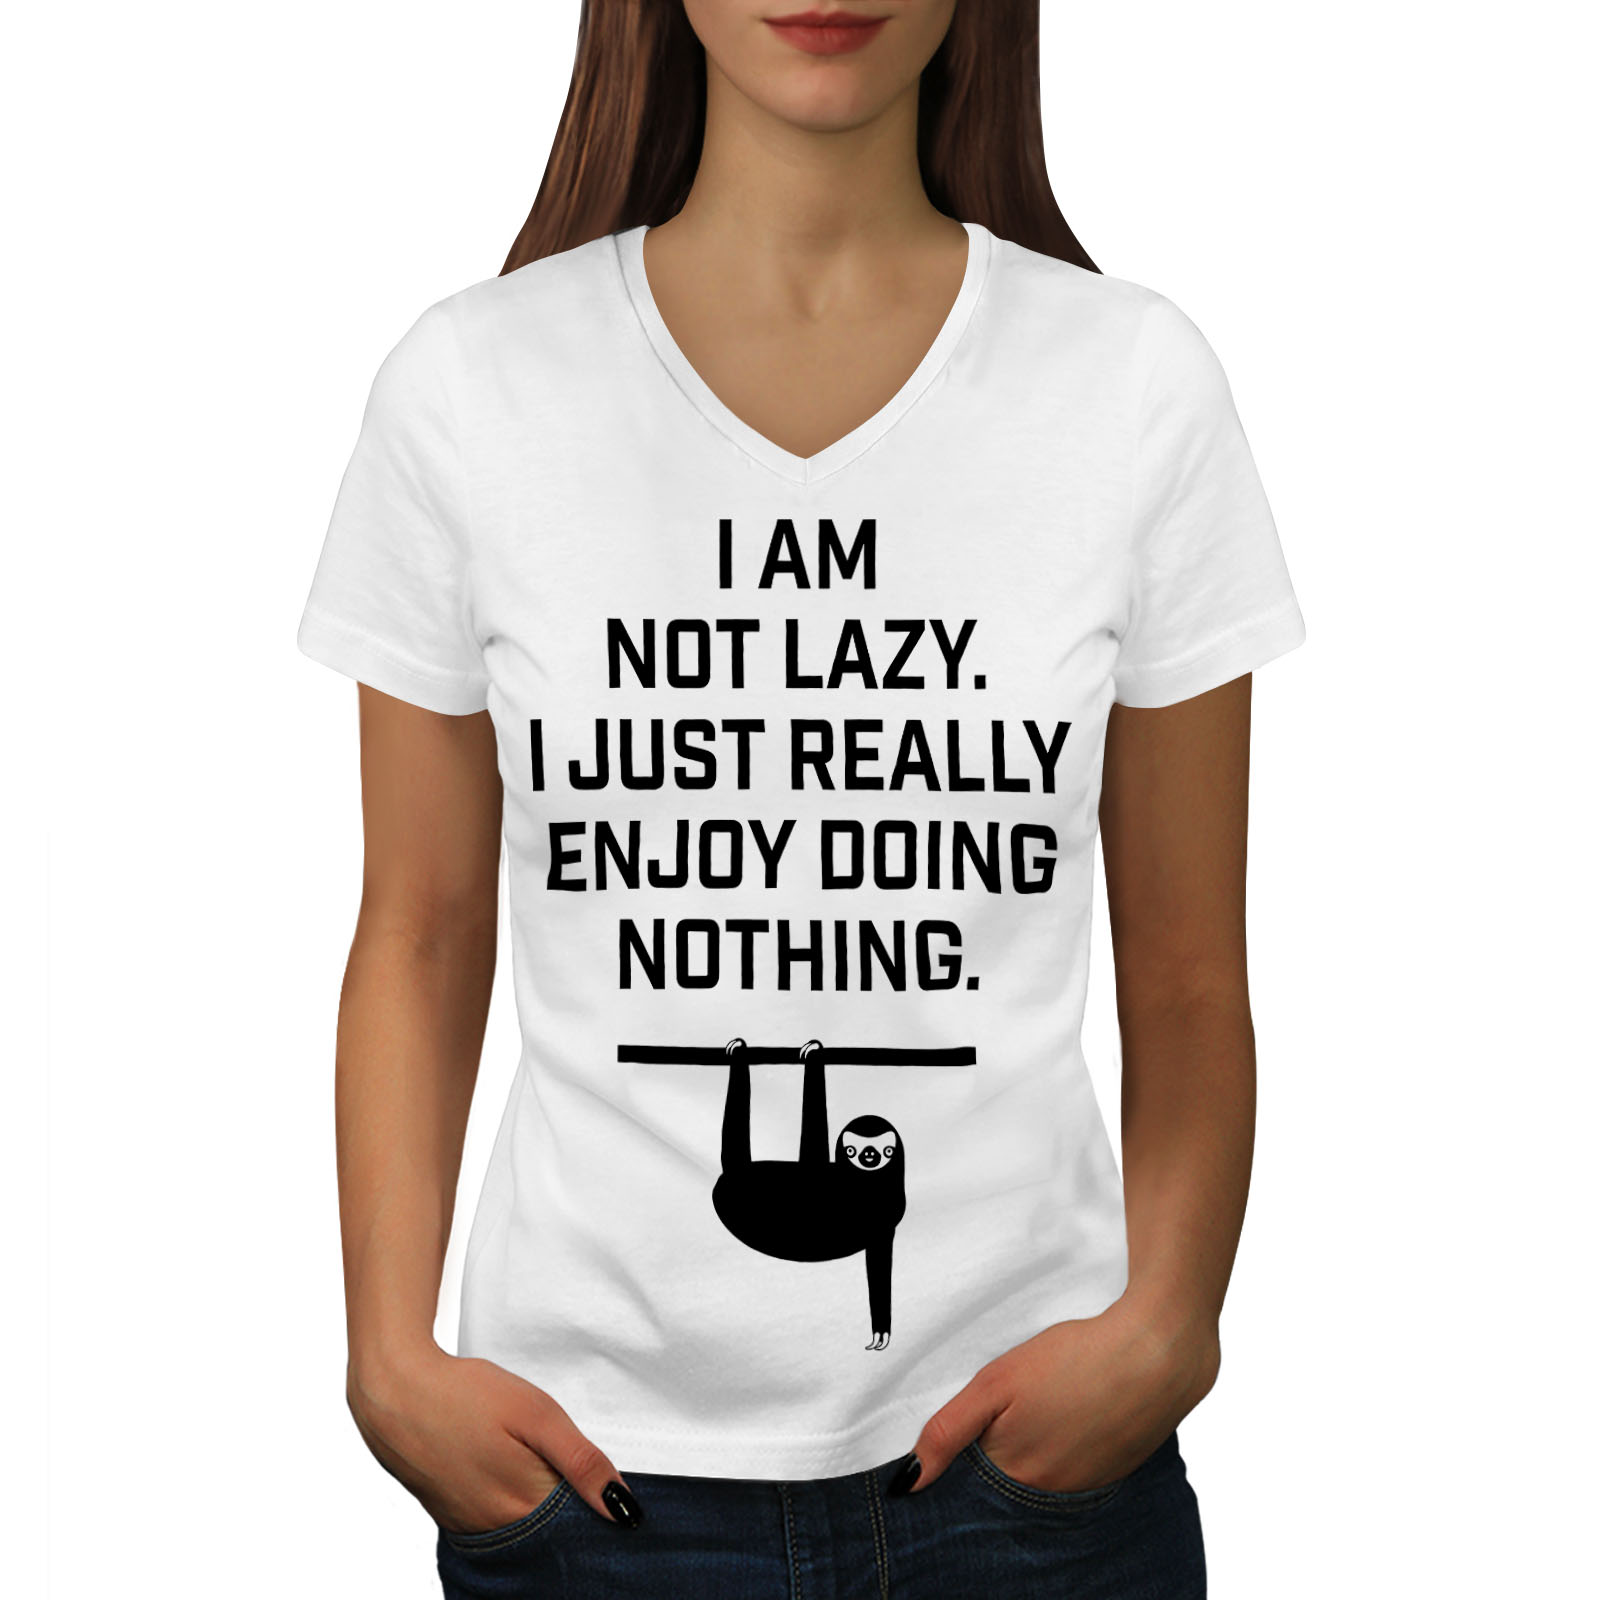 Wellcoda-Sloth-Lazy-Joke-Funny-Womens-V-Neck-T-shirt-Monkey-Graphic-Design-Tee thumbnail 7